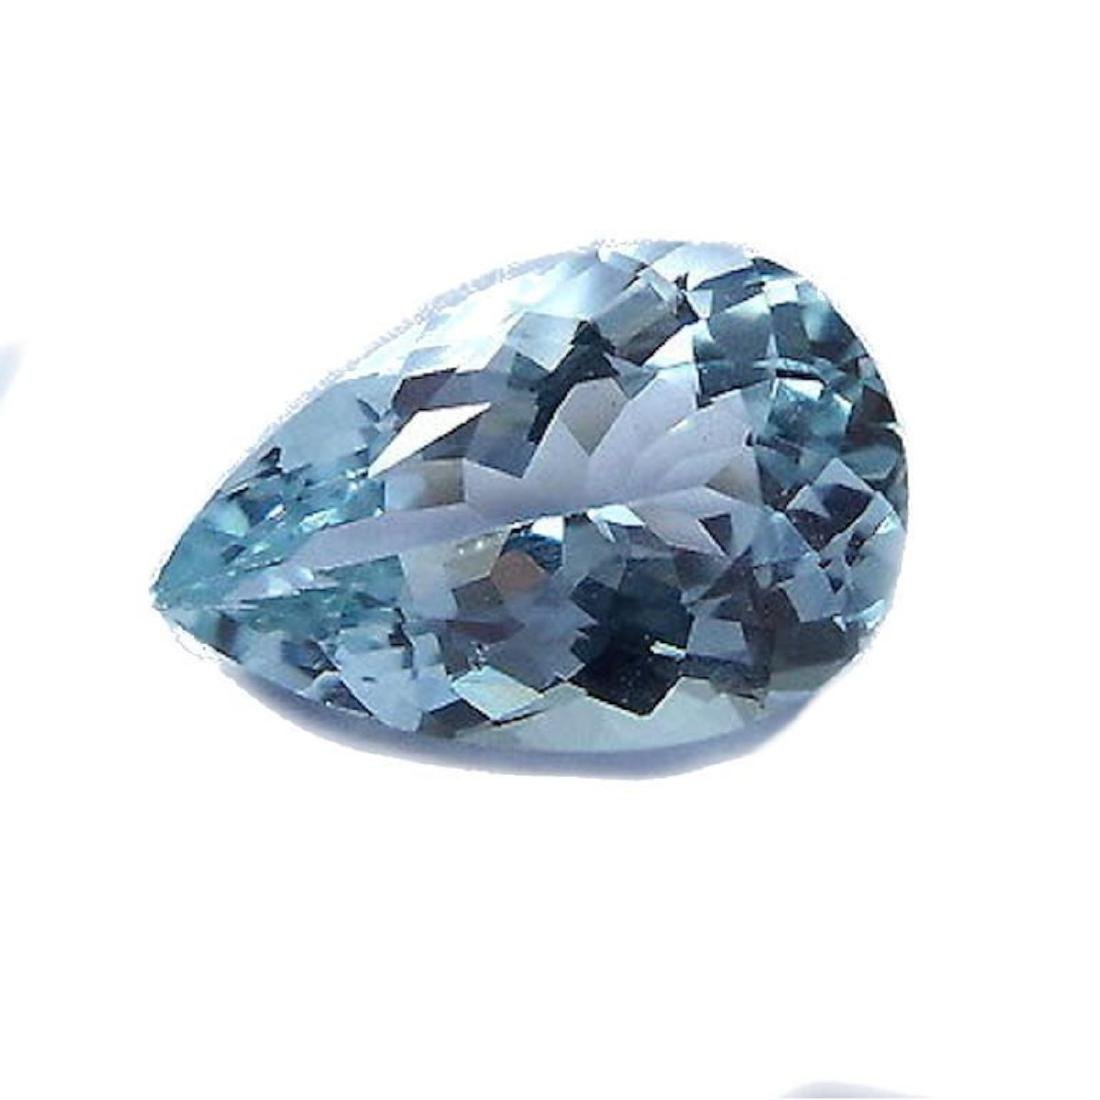 1.7ct Natural Aquamarine Pear Faceted Gemstone